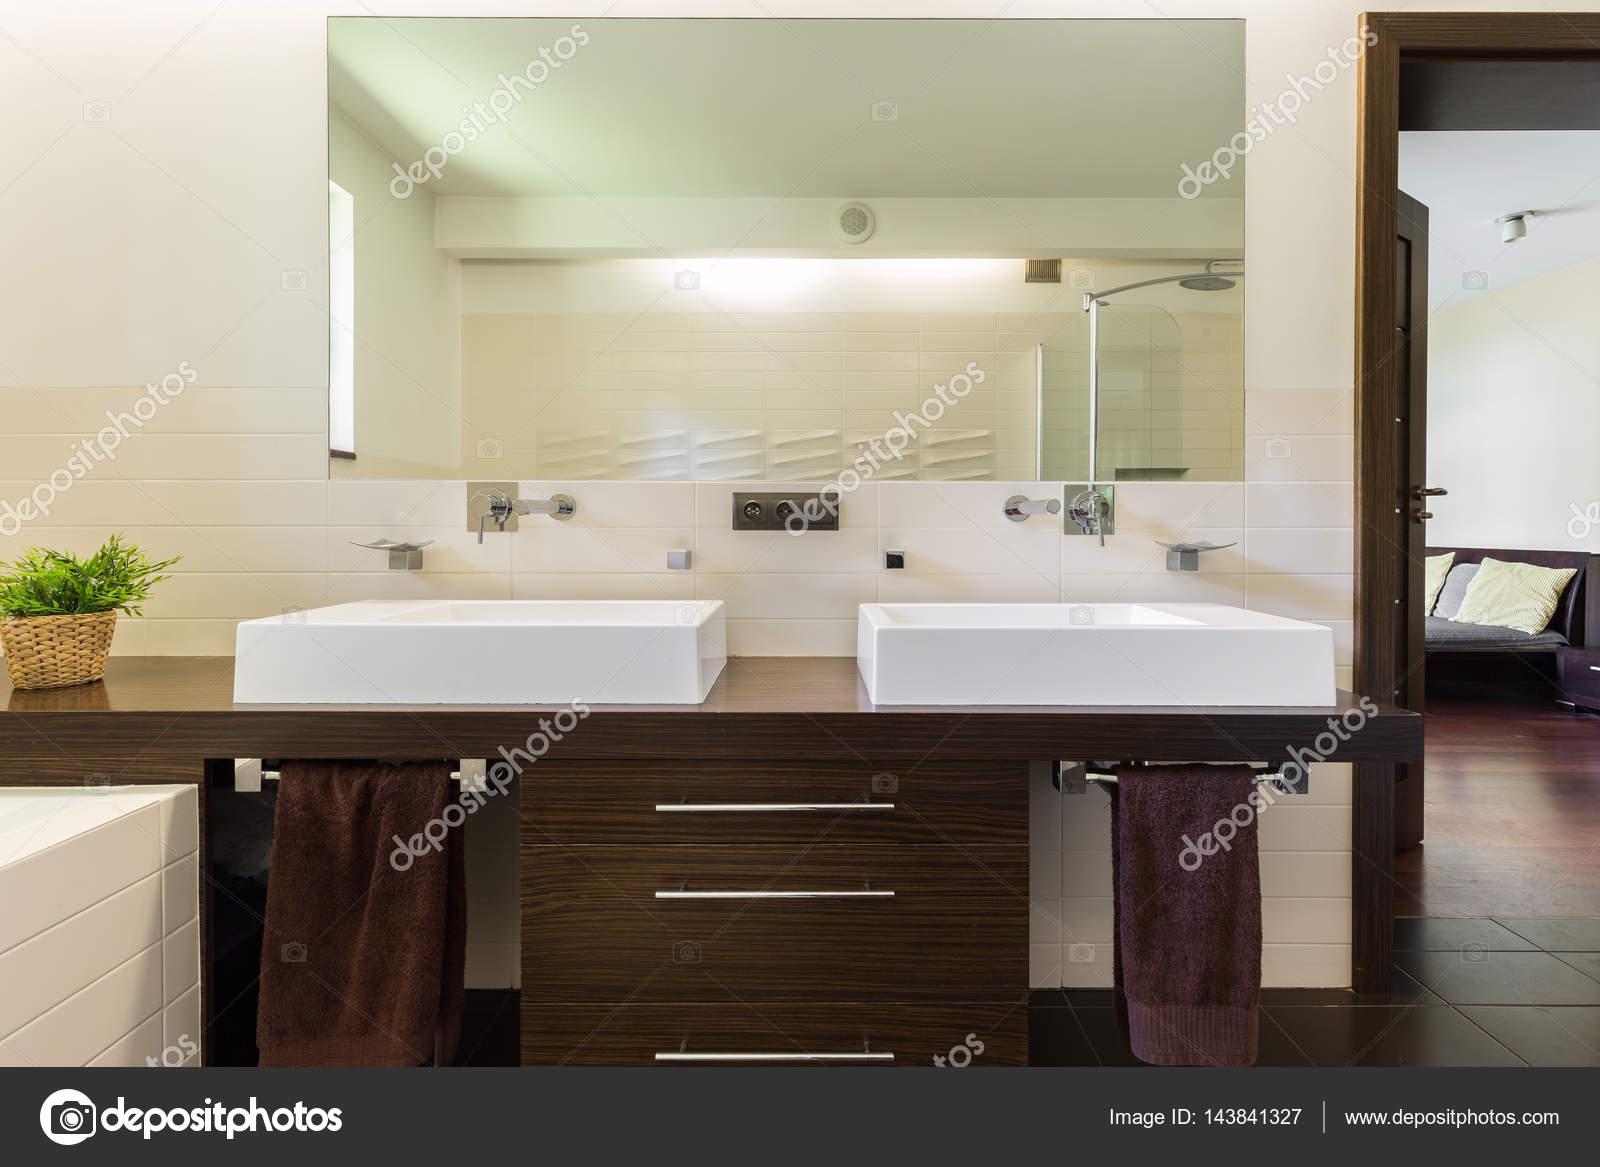 Master badkamer met twee wastafels en spiegel u stockfoto